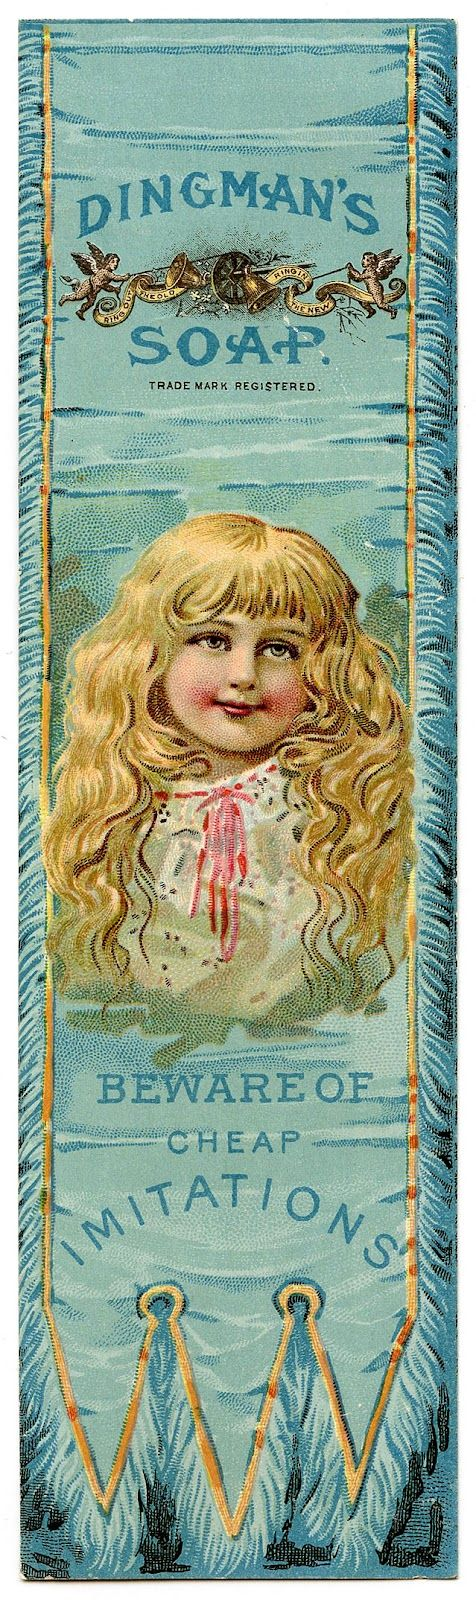 Victorian Bookmark - Pretty Little Girl - The Graphics Fairy